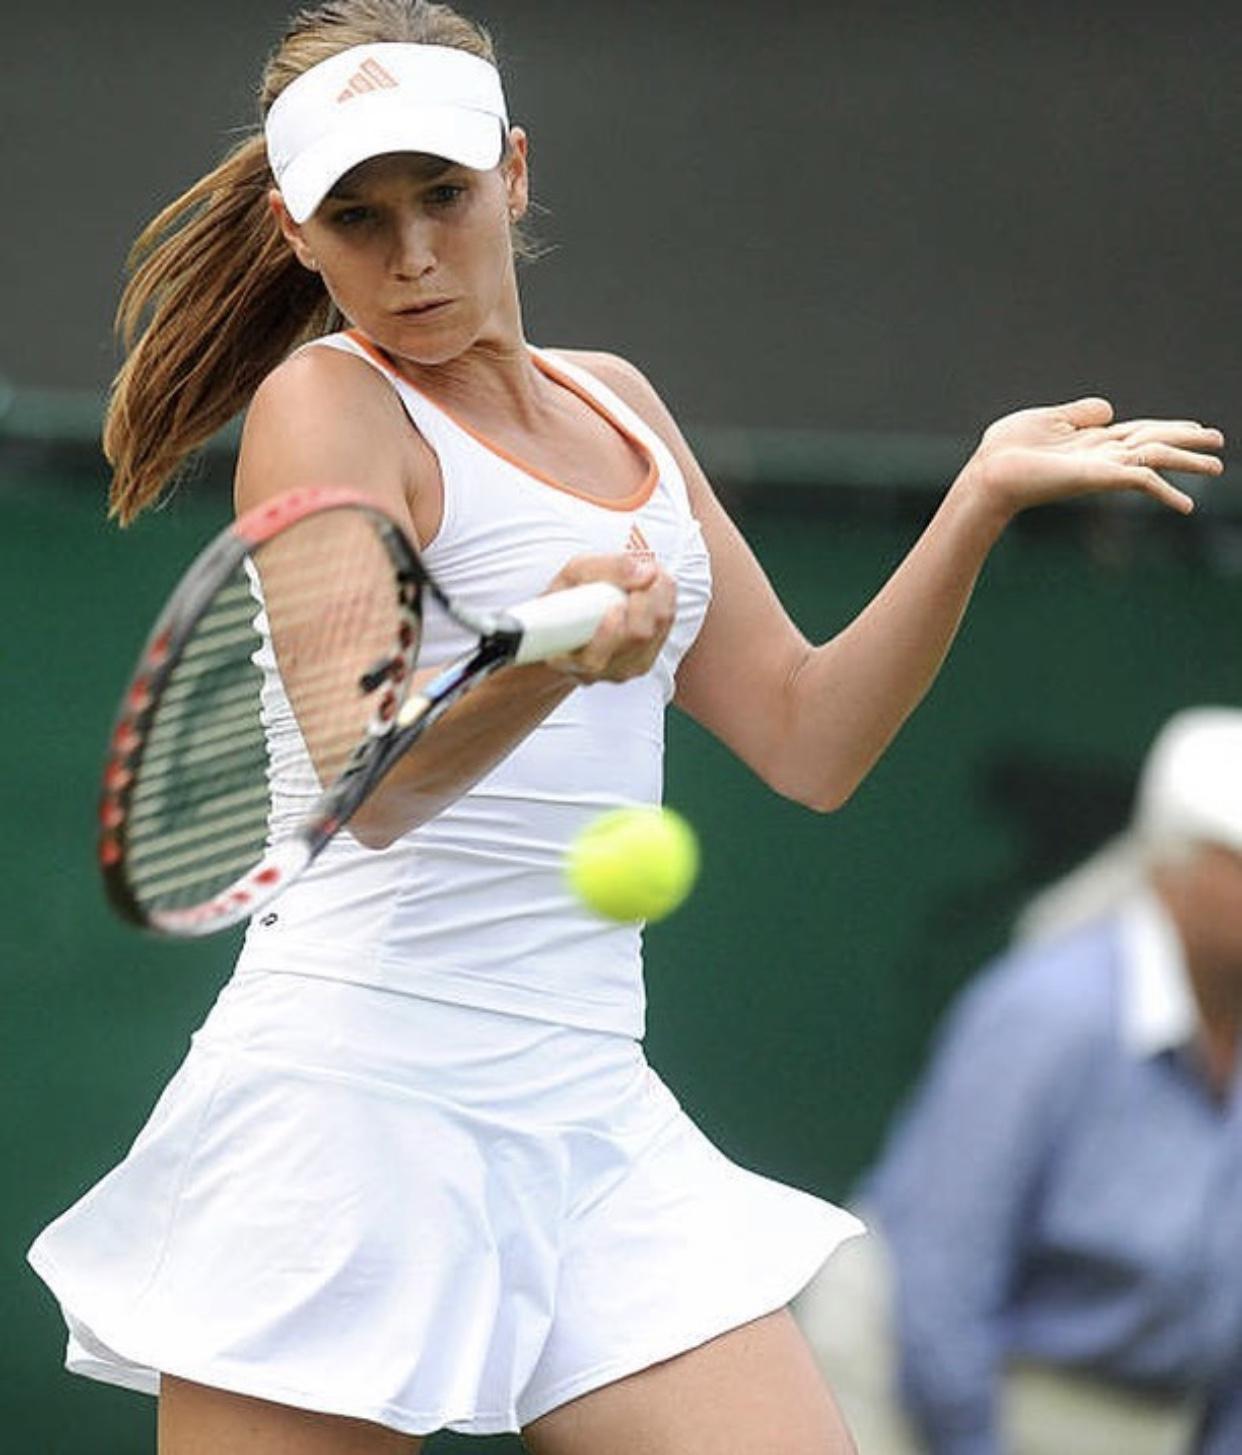 Ex-tennis star Ashley Harkleroad goes naked to save money